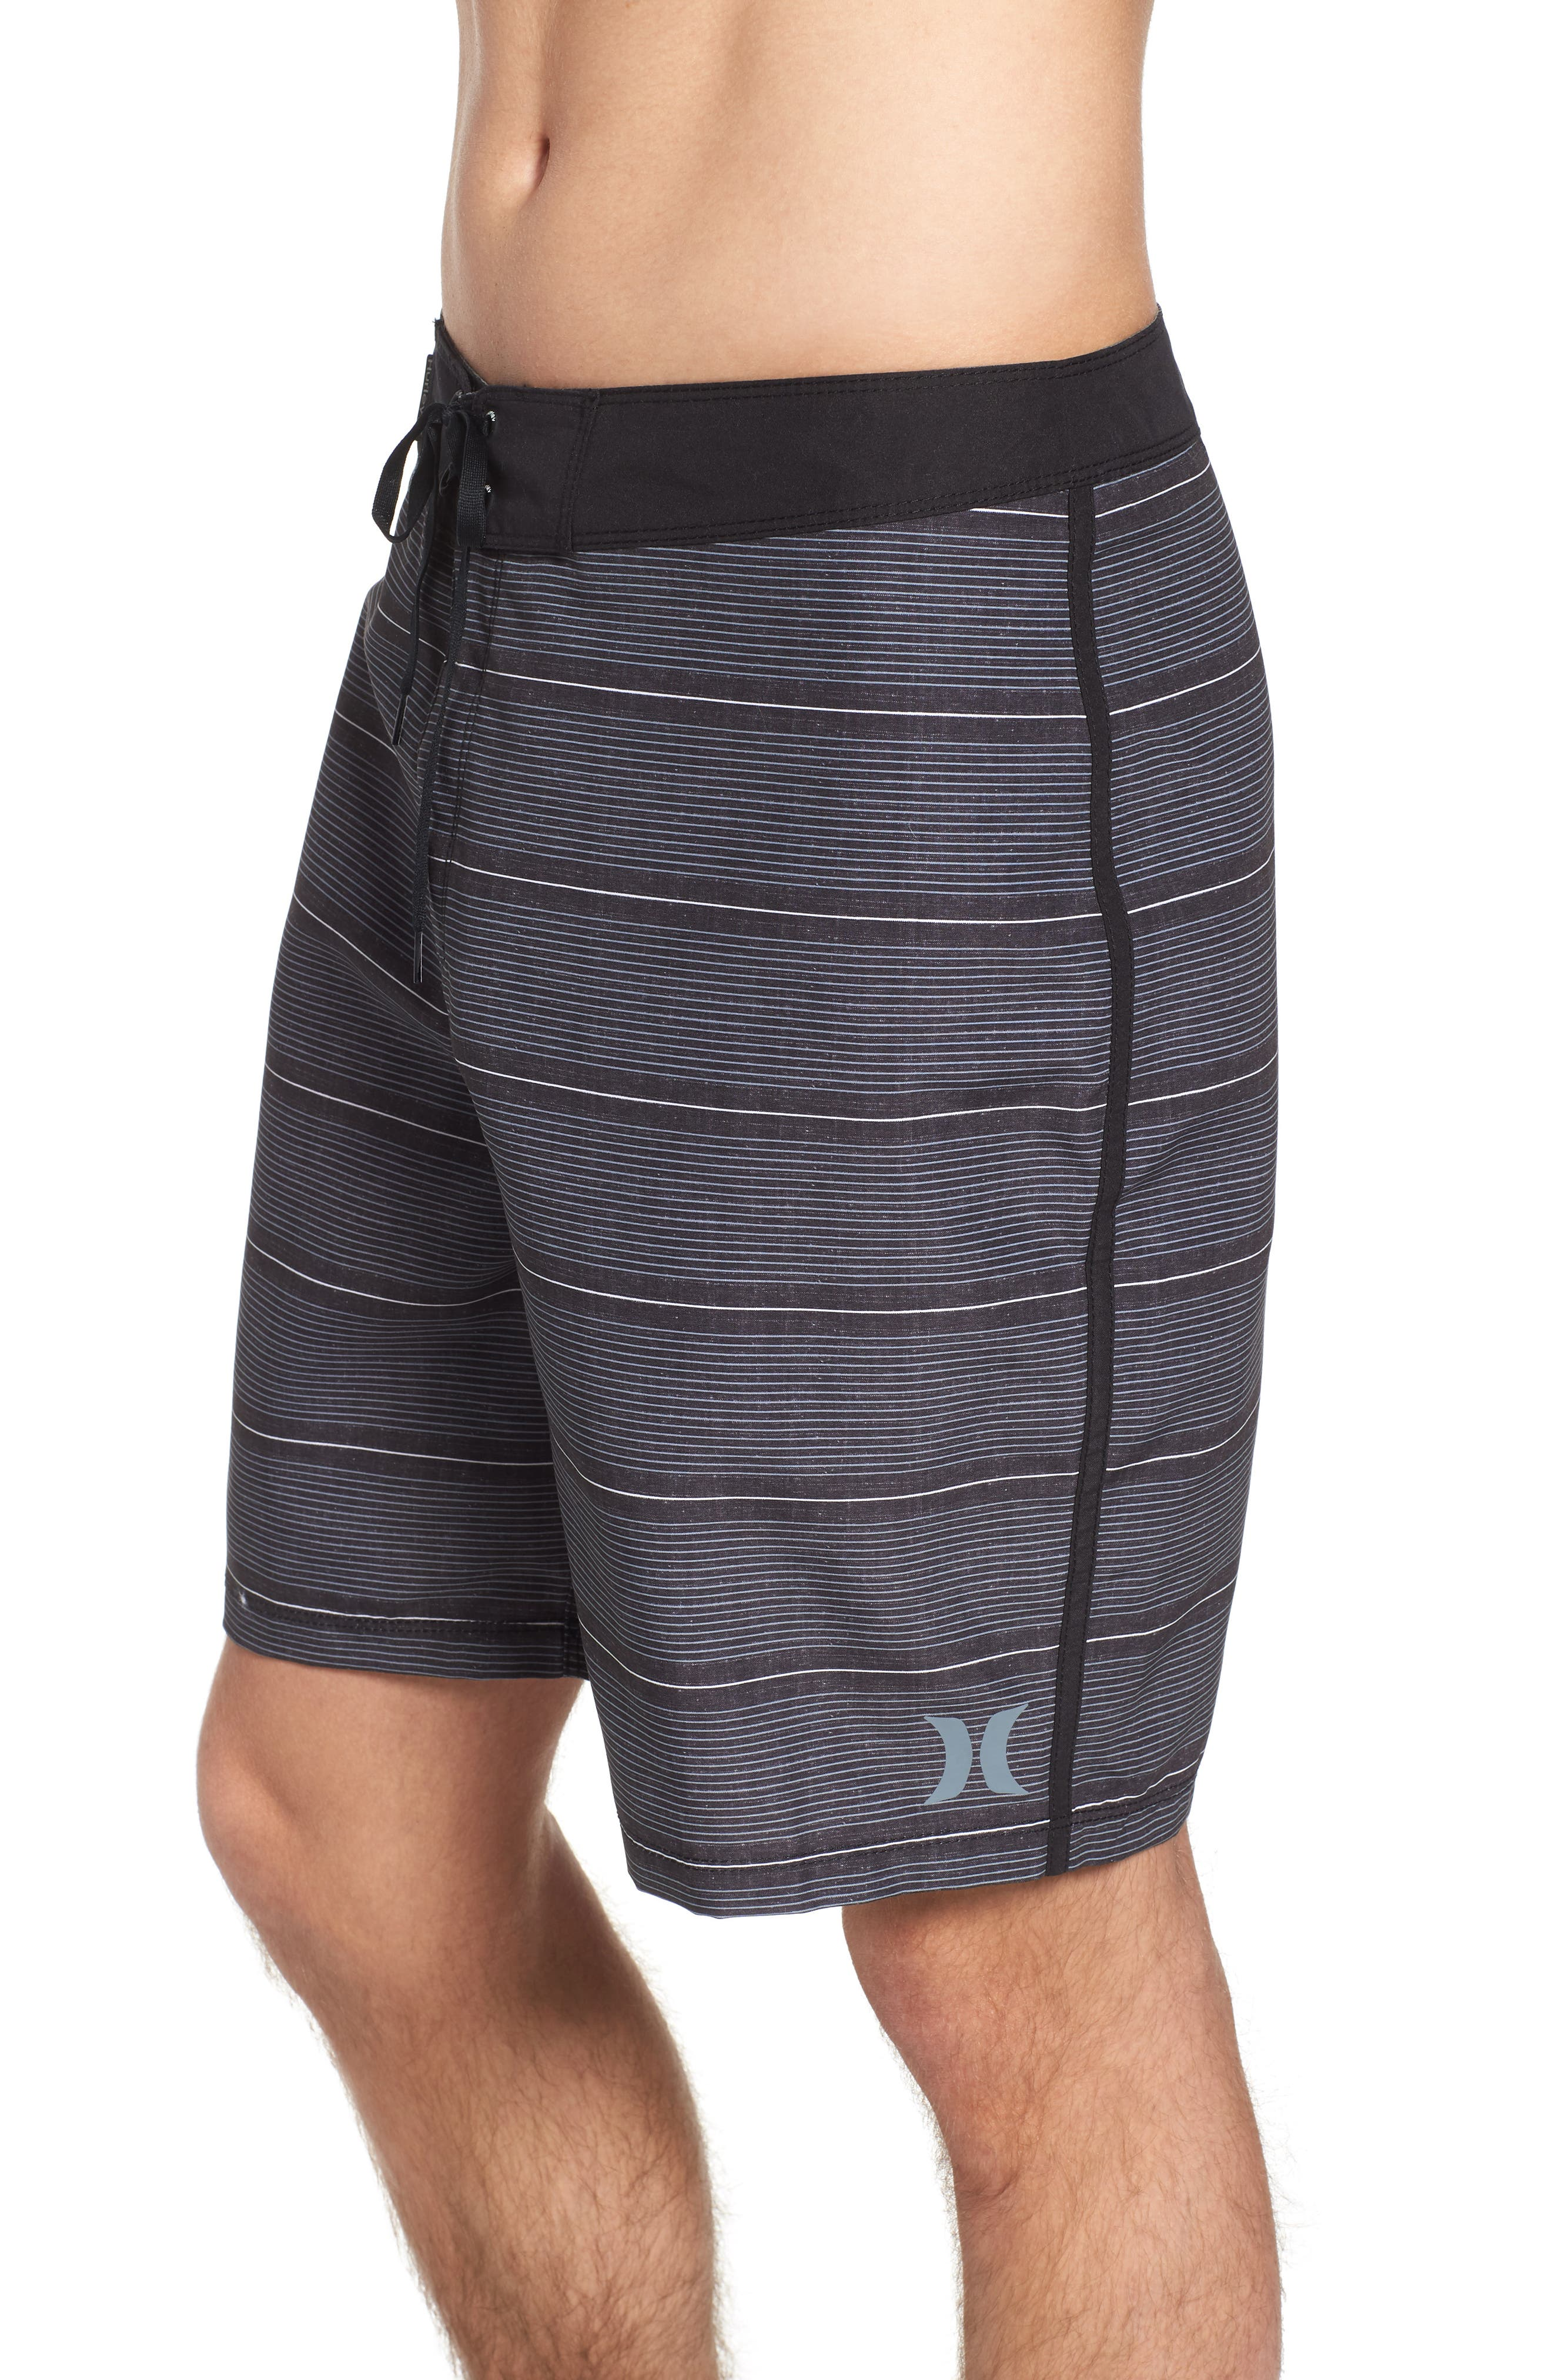 Shoreside Board Shorts,                             Alternate thumbnail 7, color,